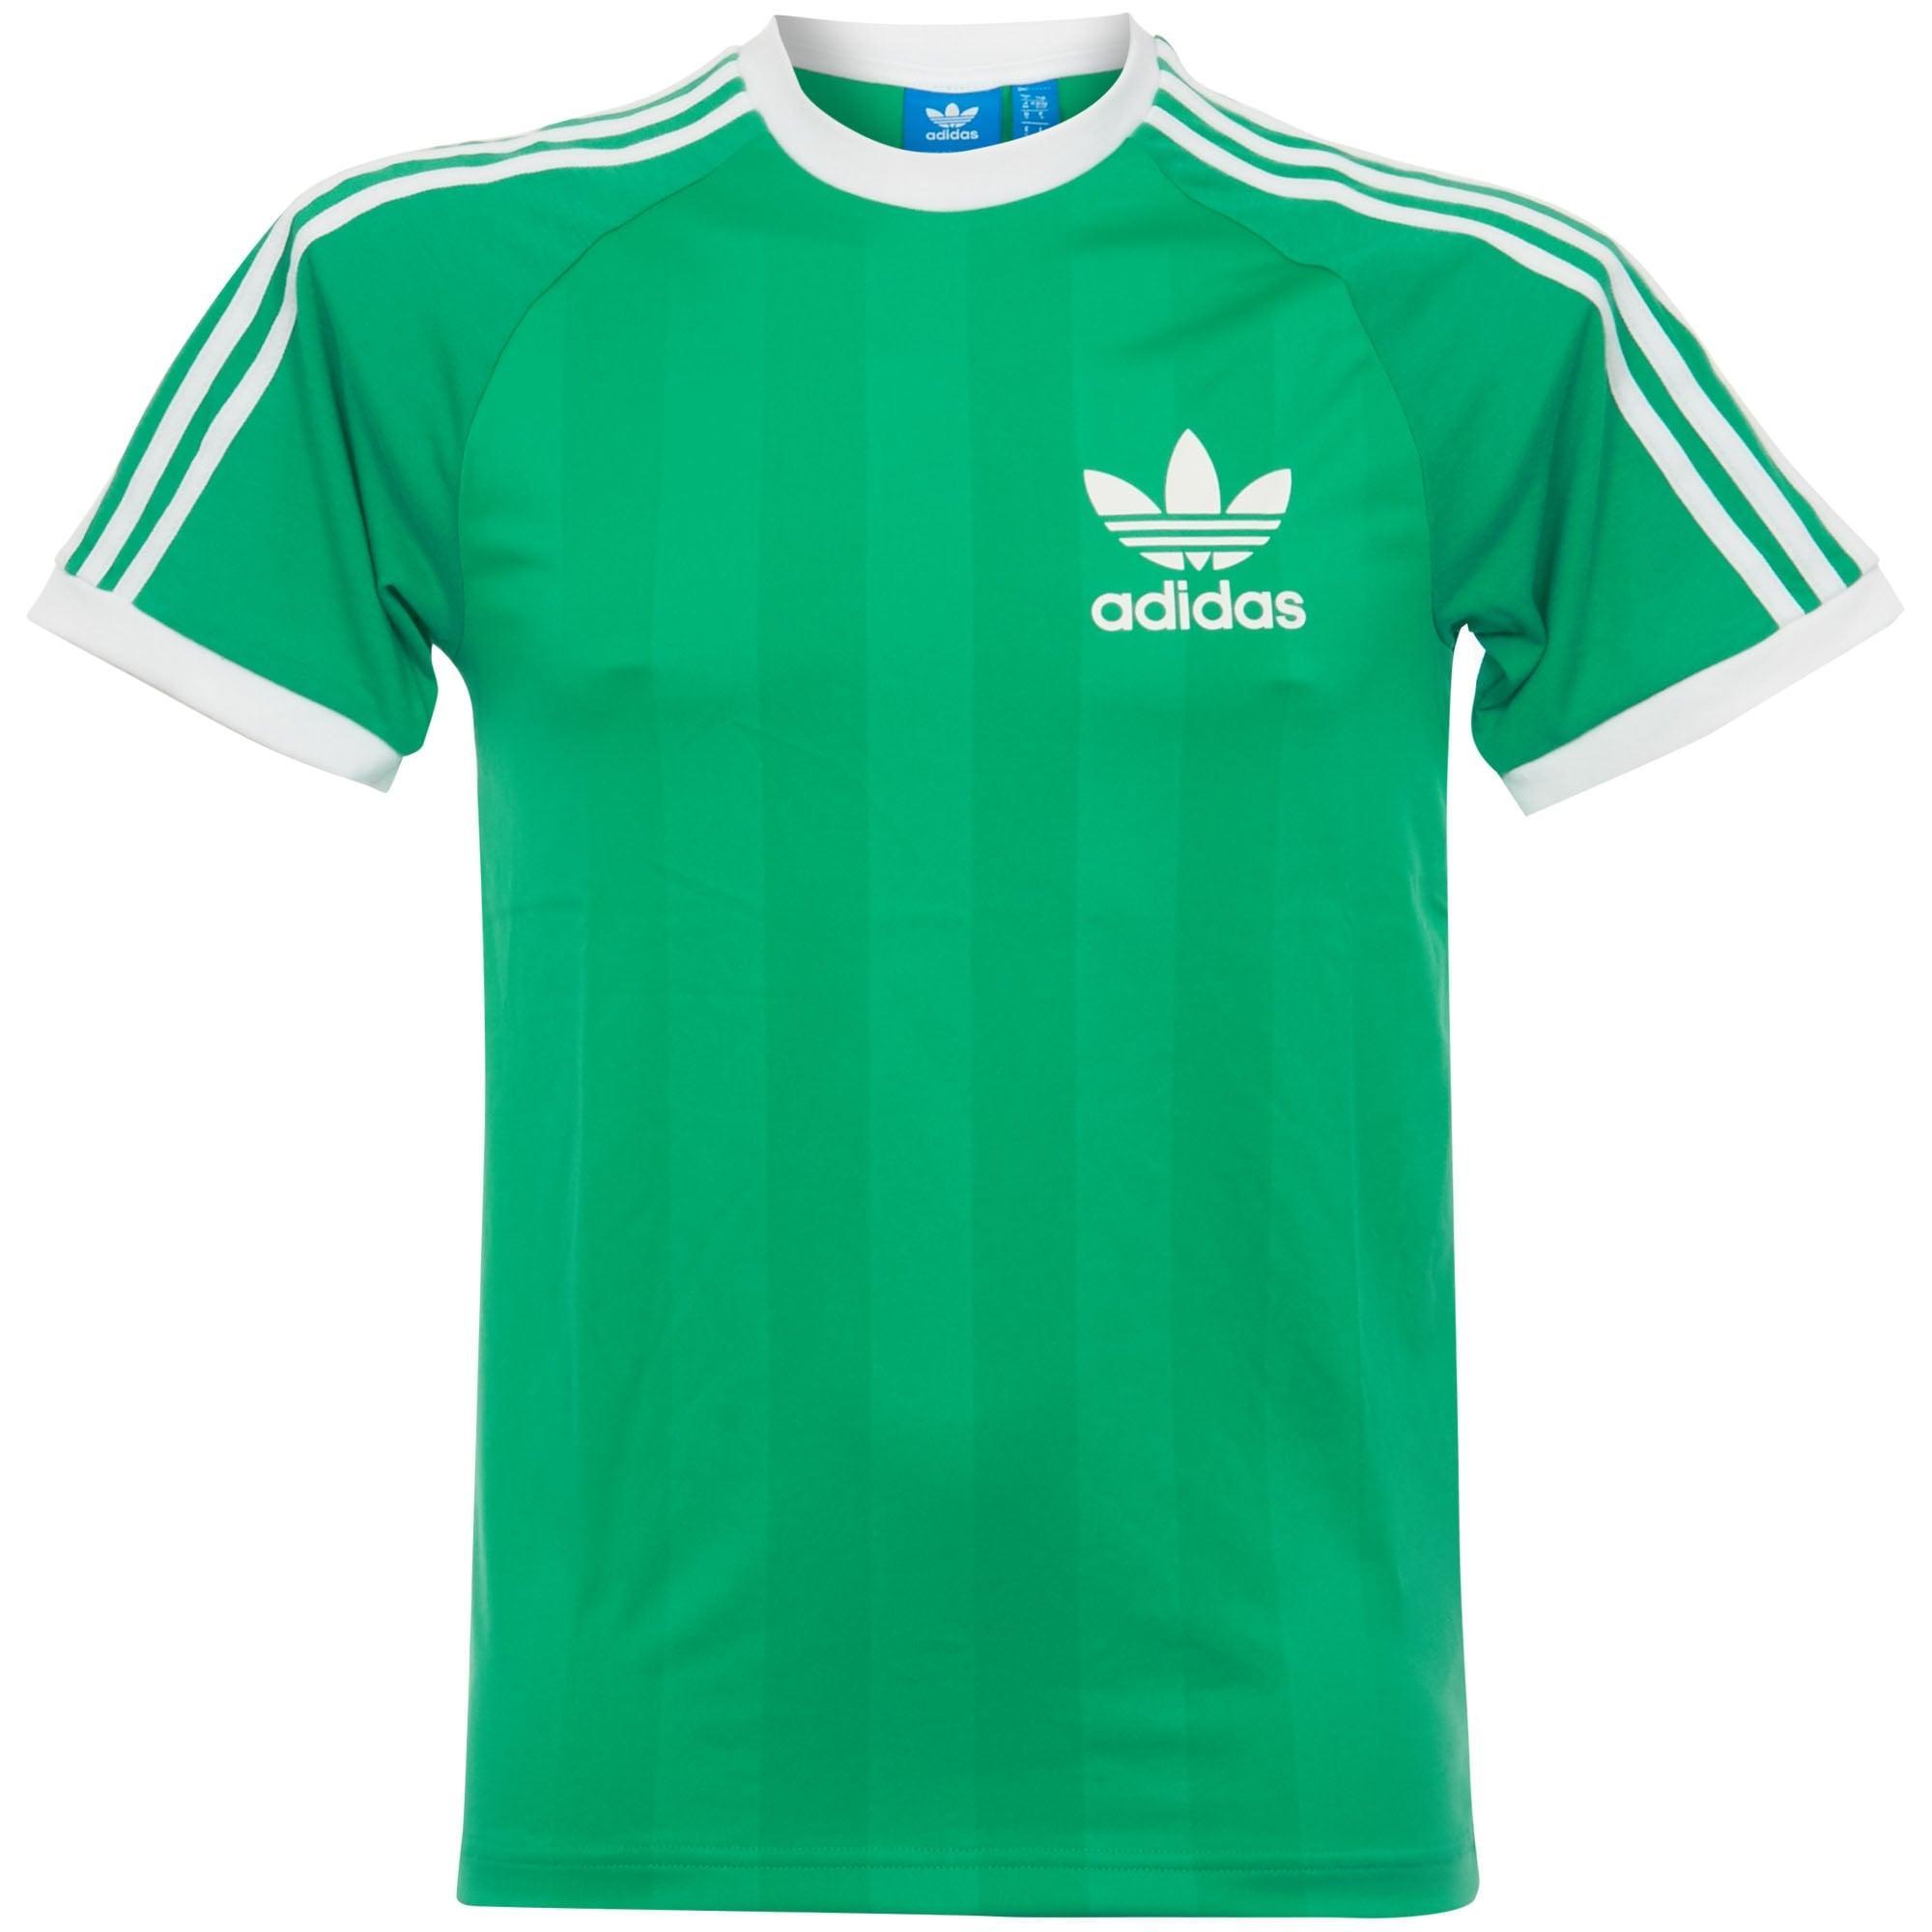 lyst adidas originals adidas clfn tee green t shirt in green for men. Black Bedroom Furniture Sets. Home Design Ideas